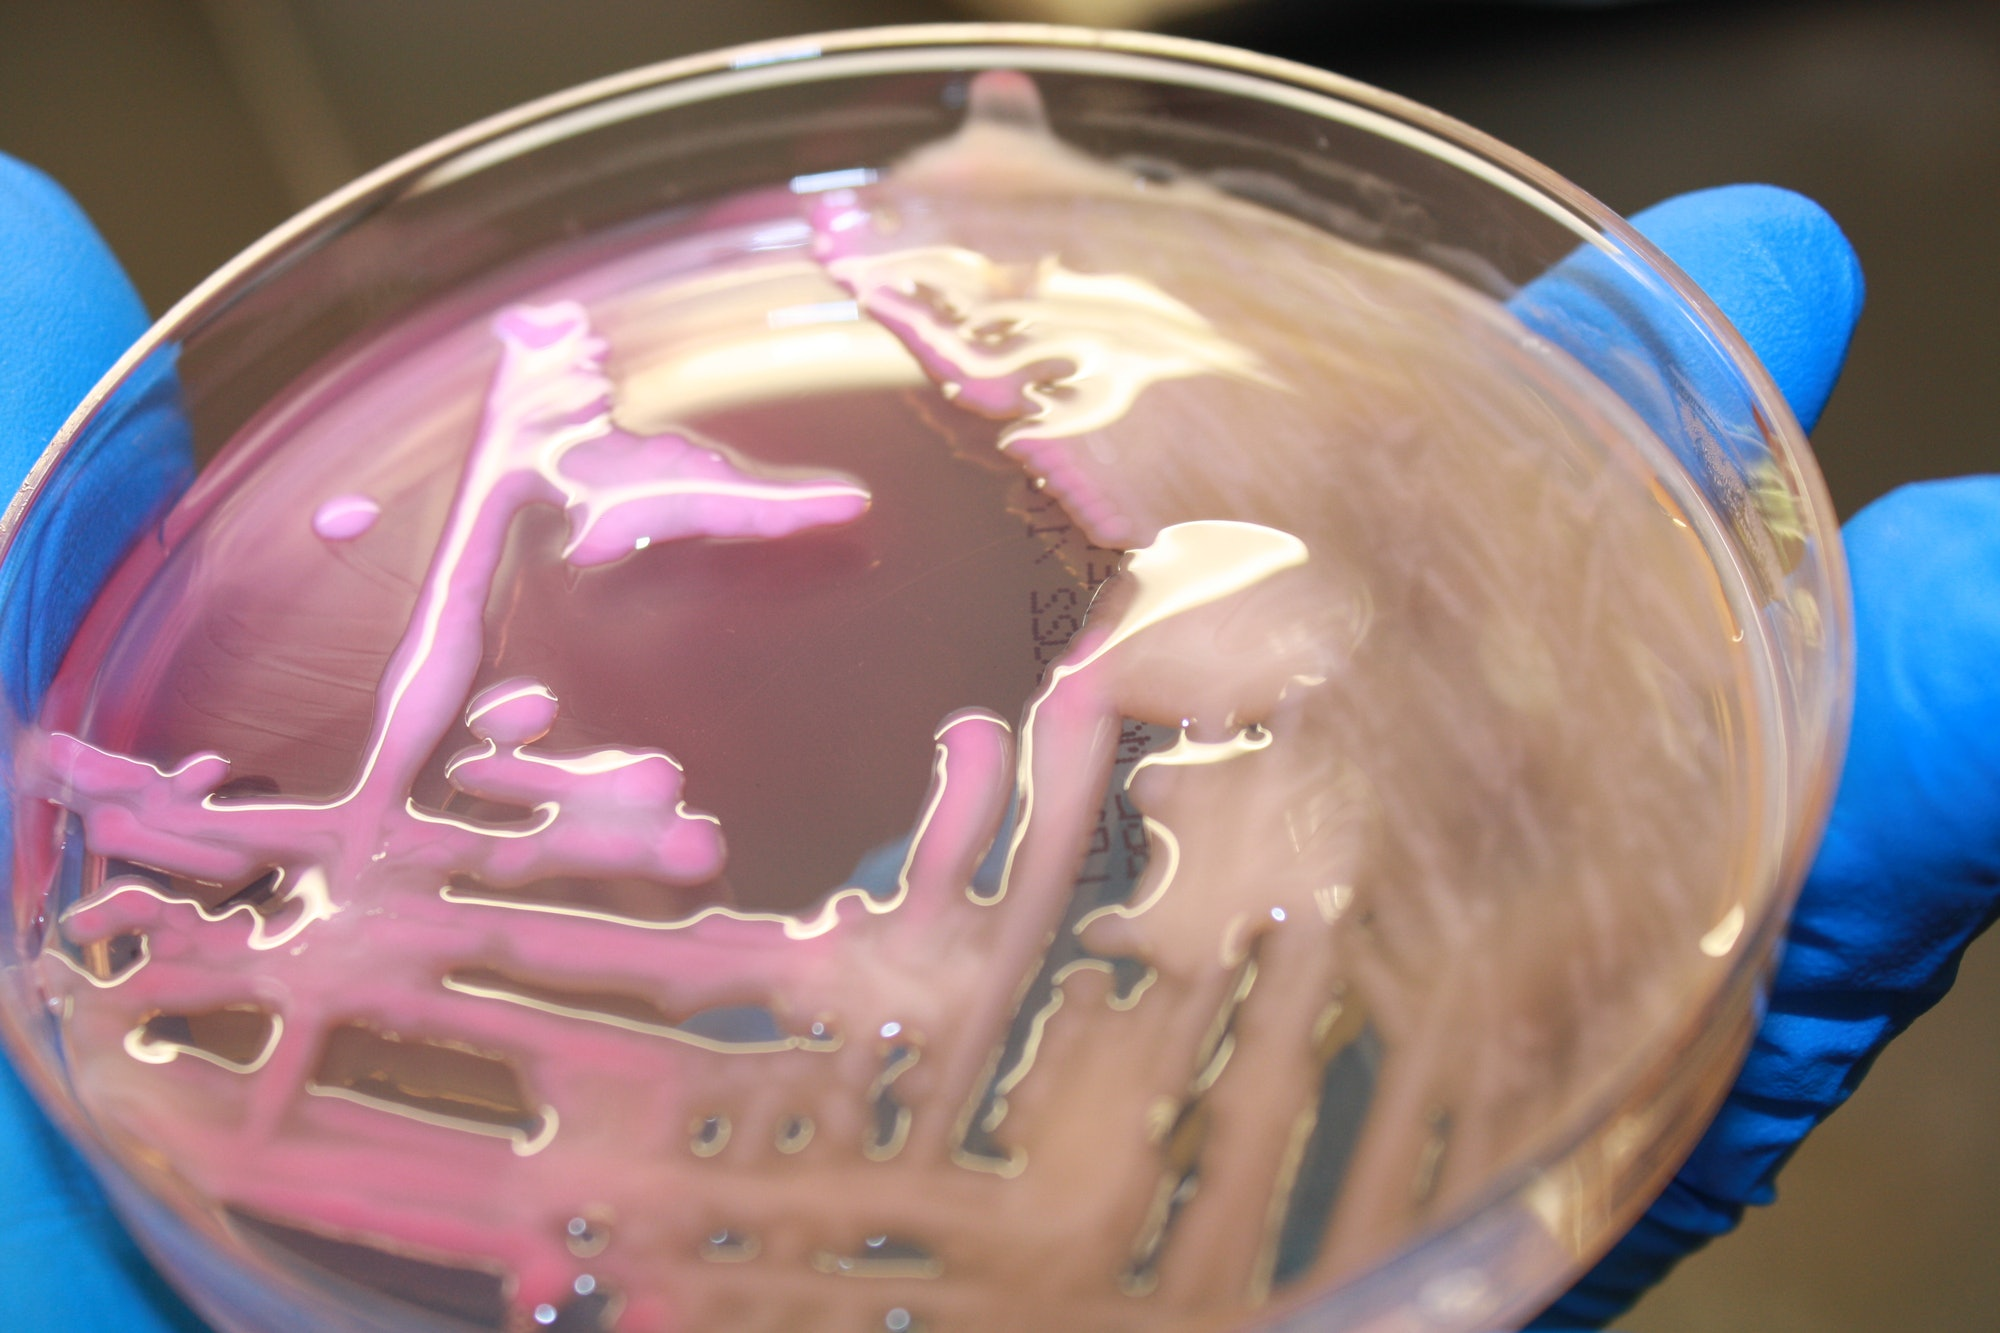 K. pneumoniae growing on MAC in a petri dish.